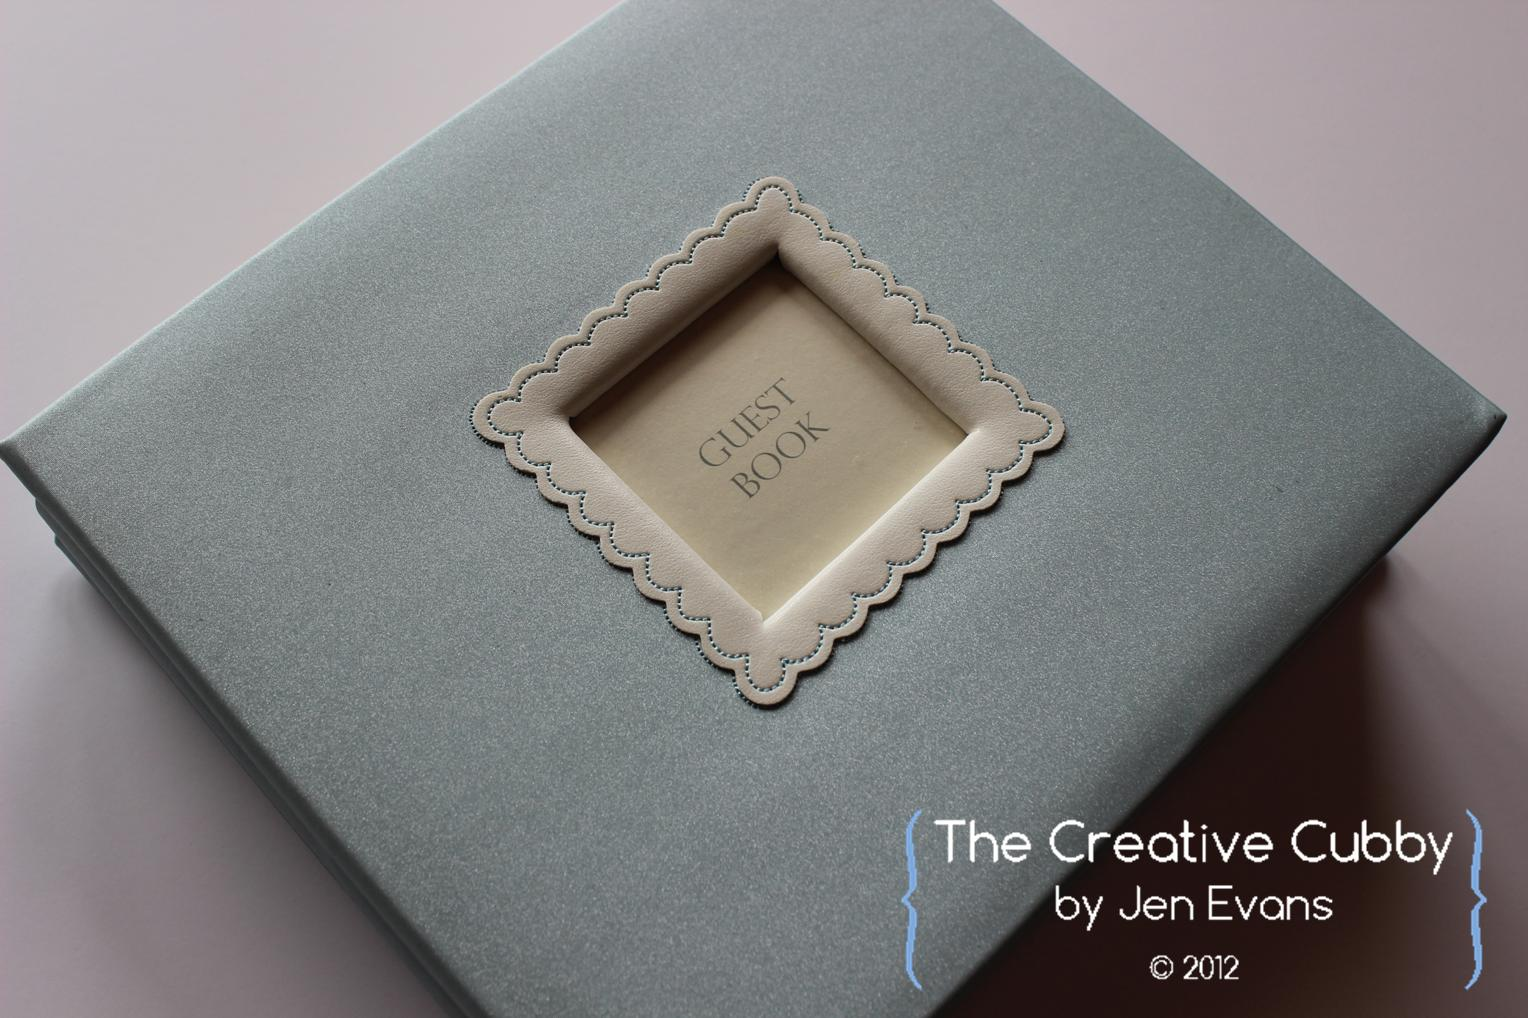 Scrapbook guest book ideas - Select Your Guest Book